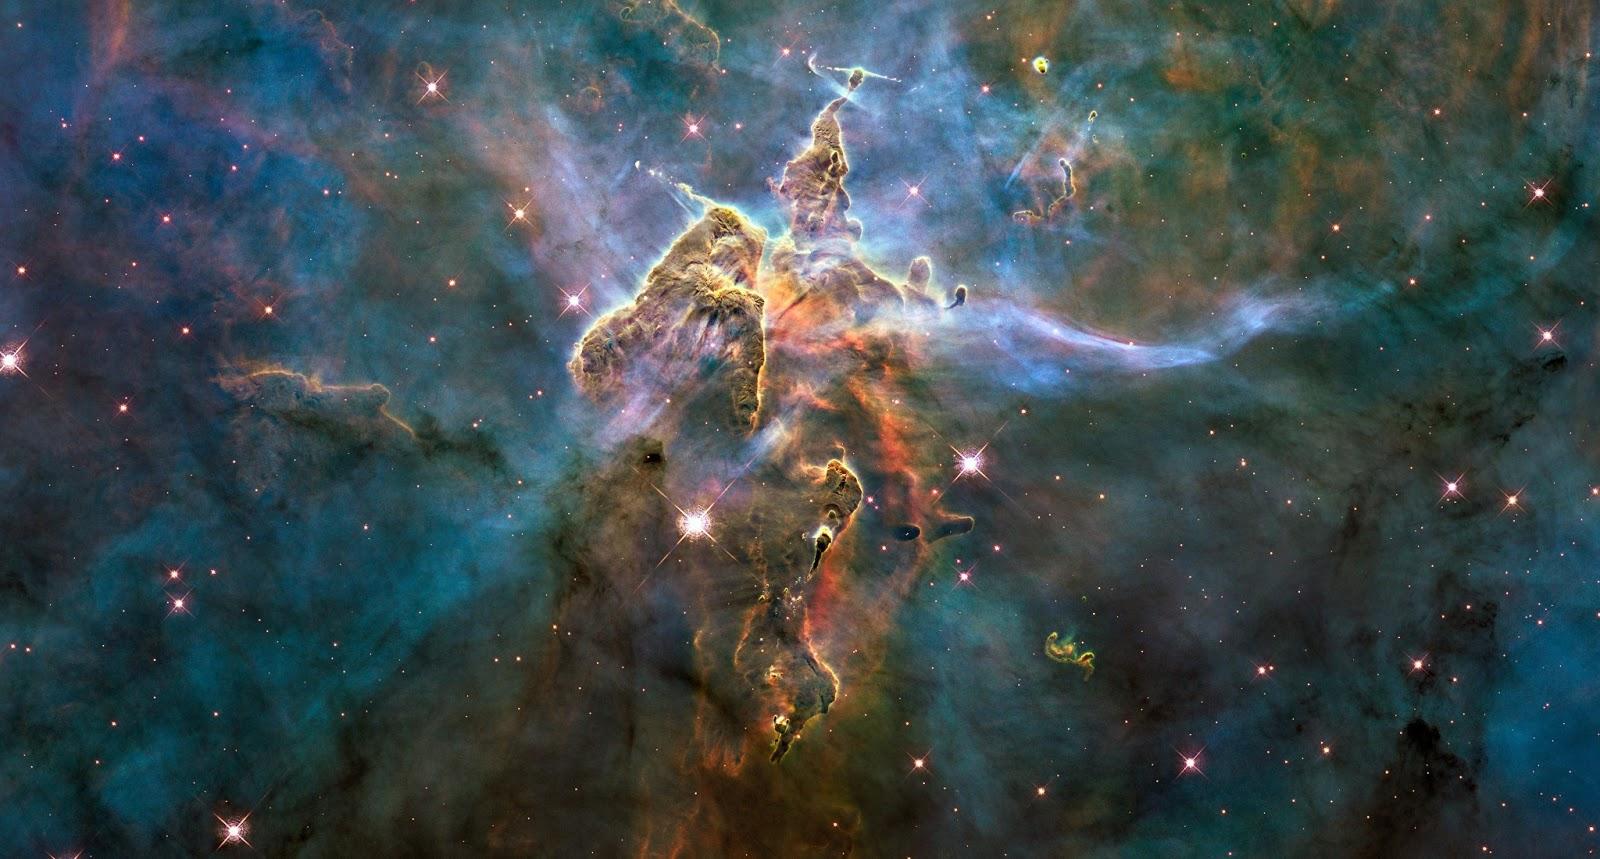 hubble space telescope - photo #17